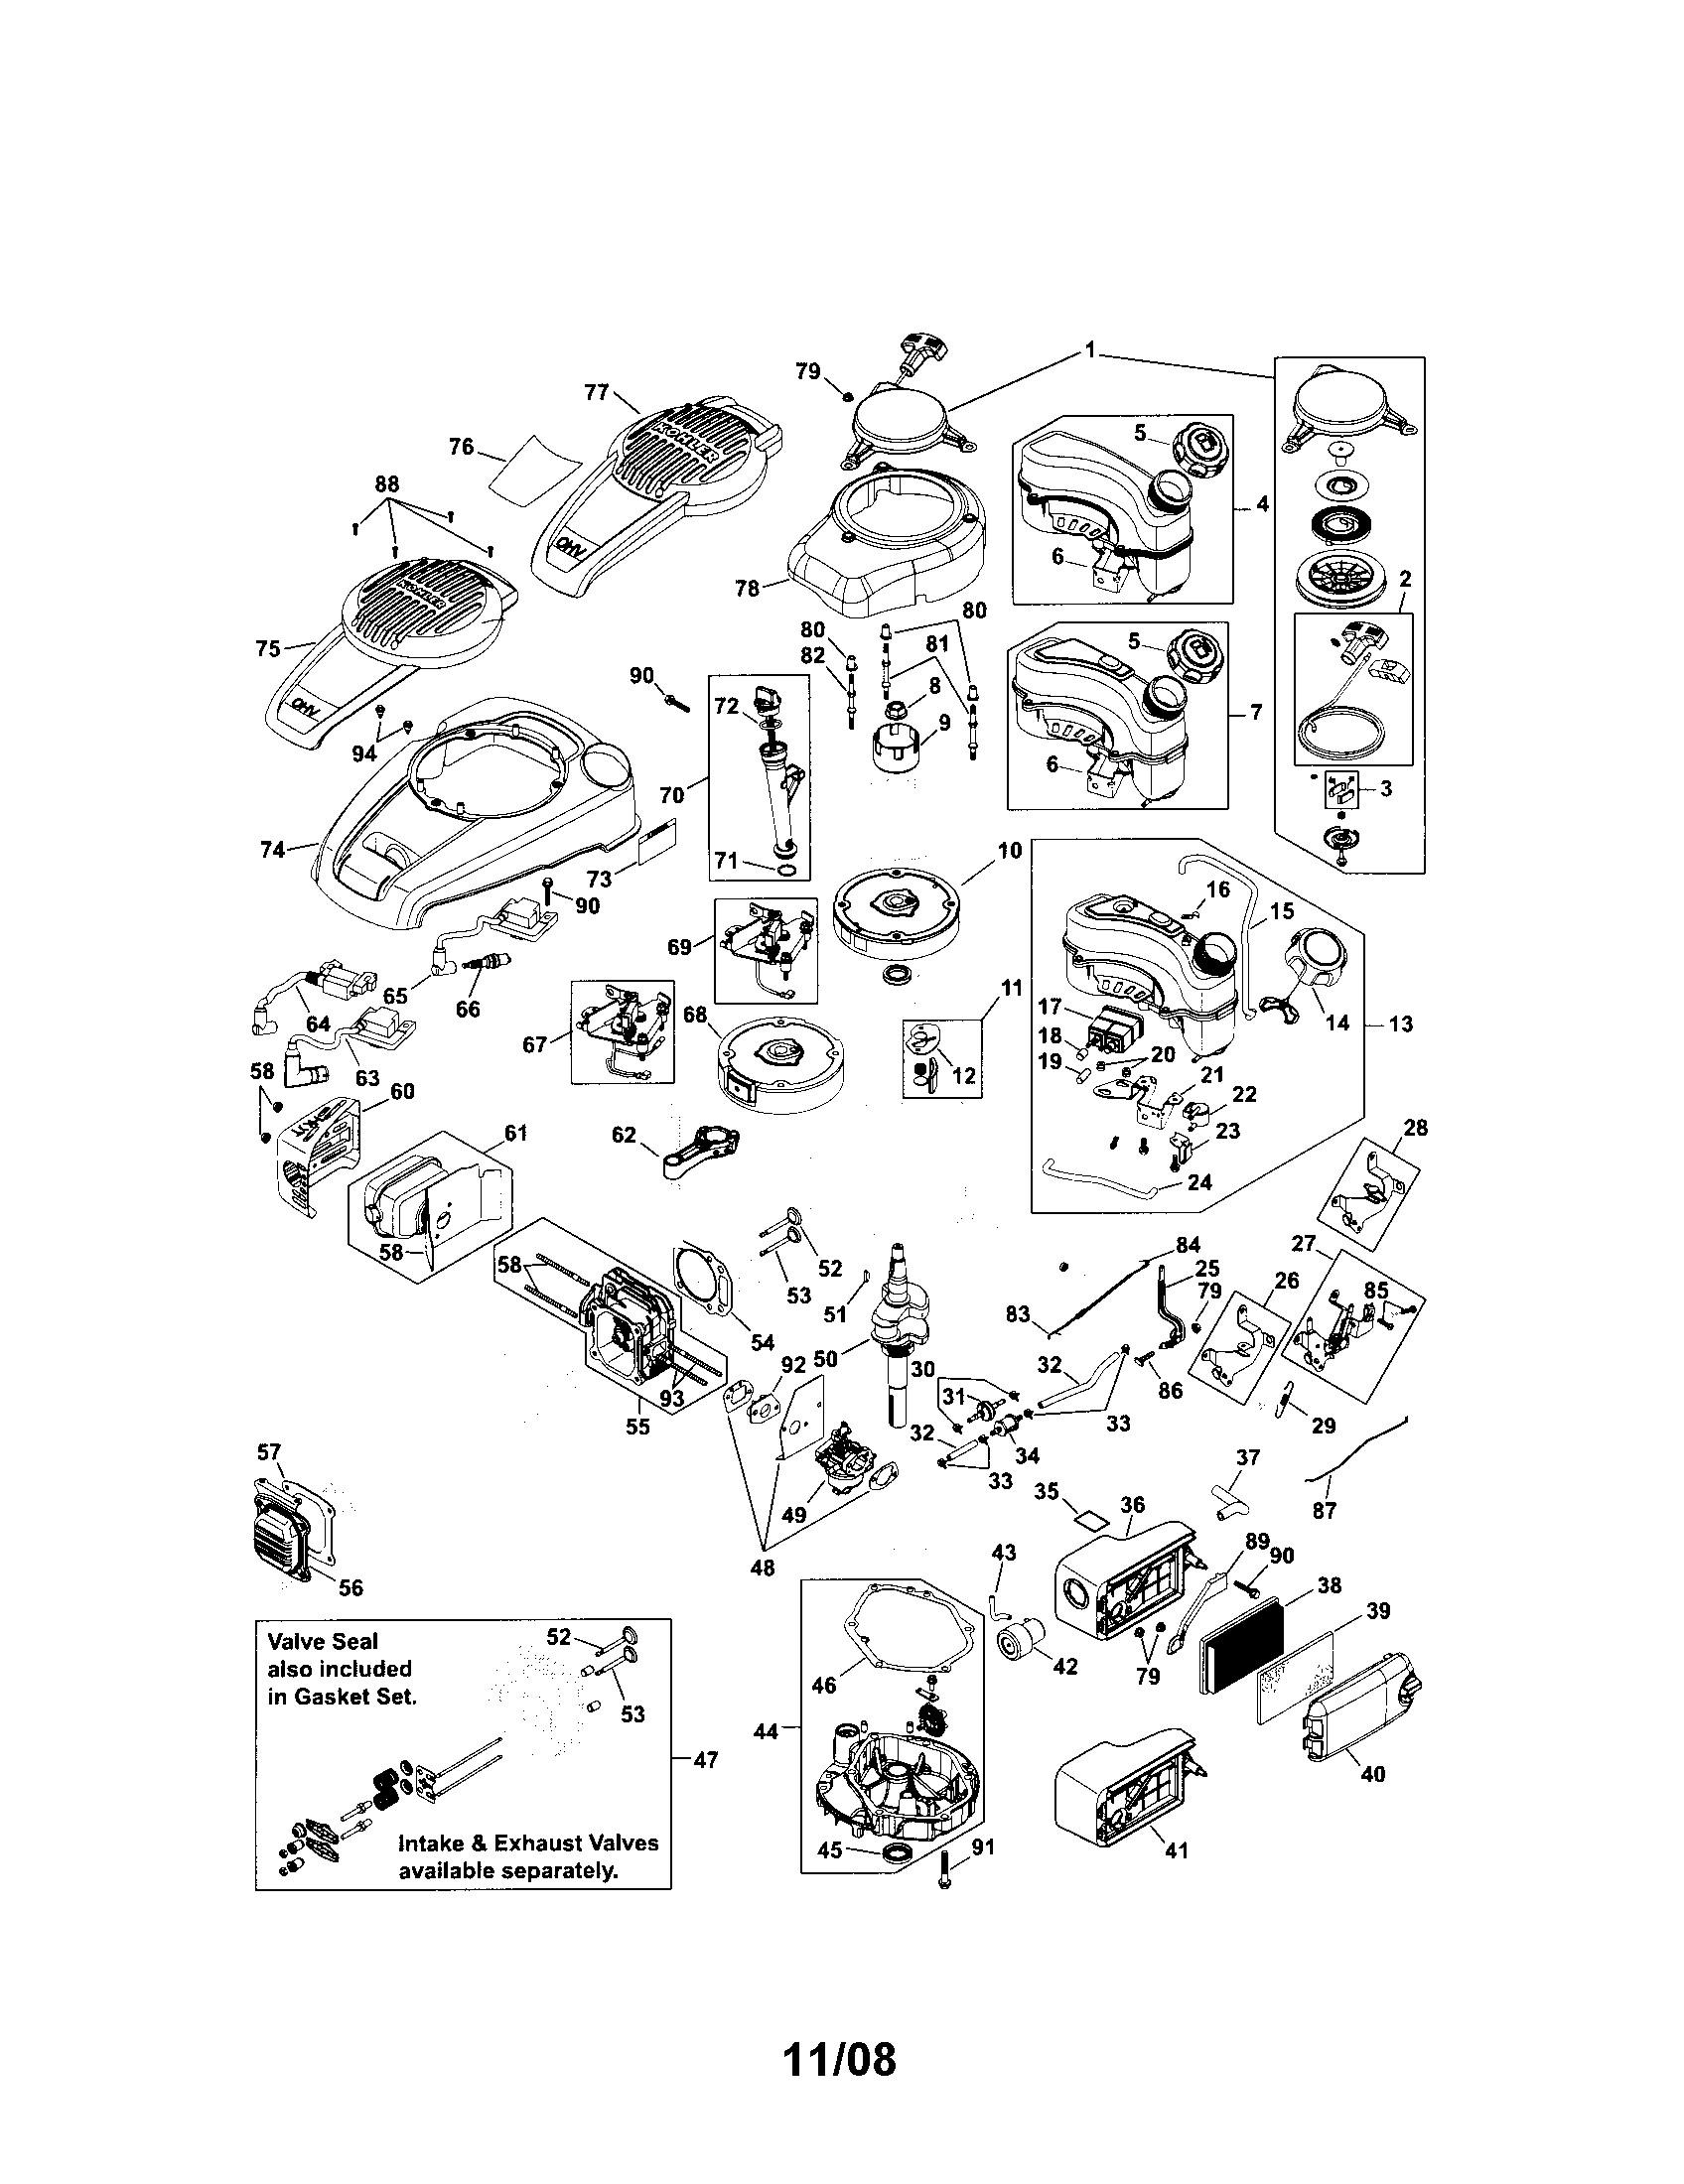 hight resolution of kohler k301s engine parts diagrams data wiring diagrams u2022 kohler carburetor breakdown kohler k321 engine